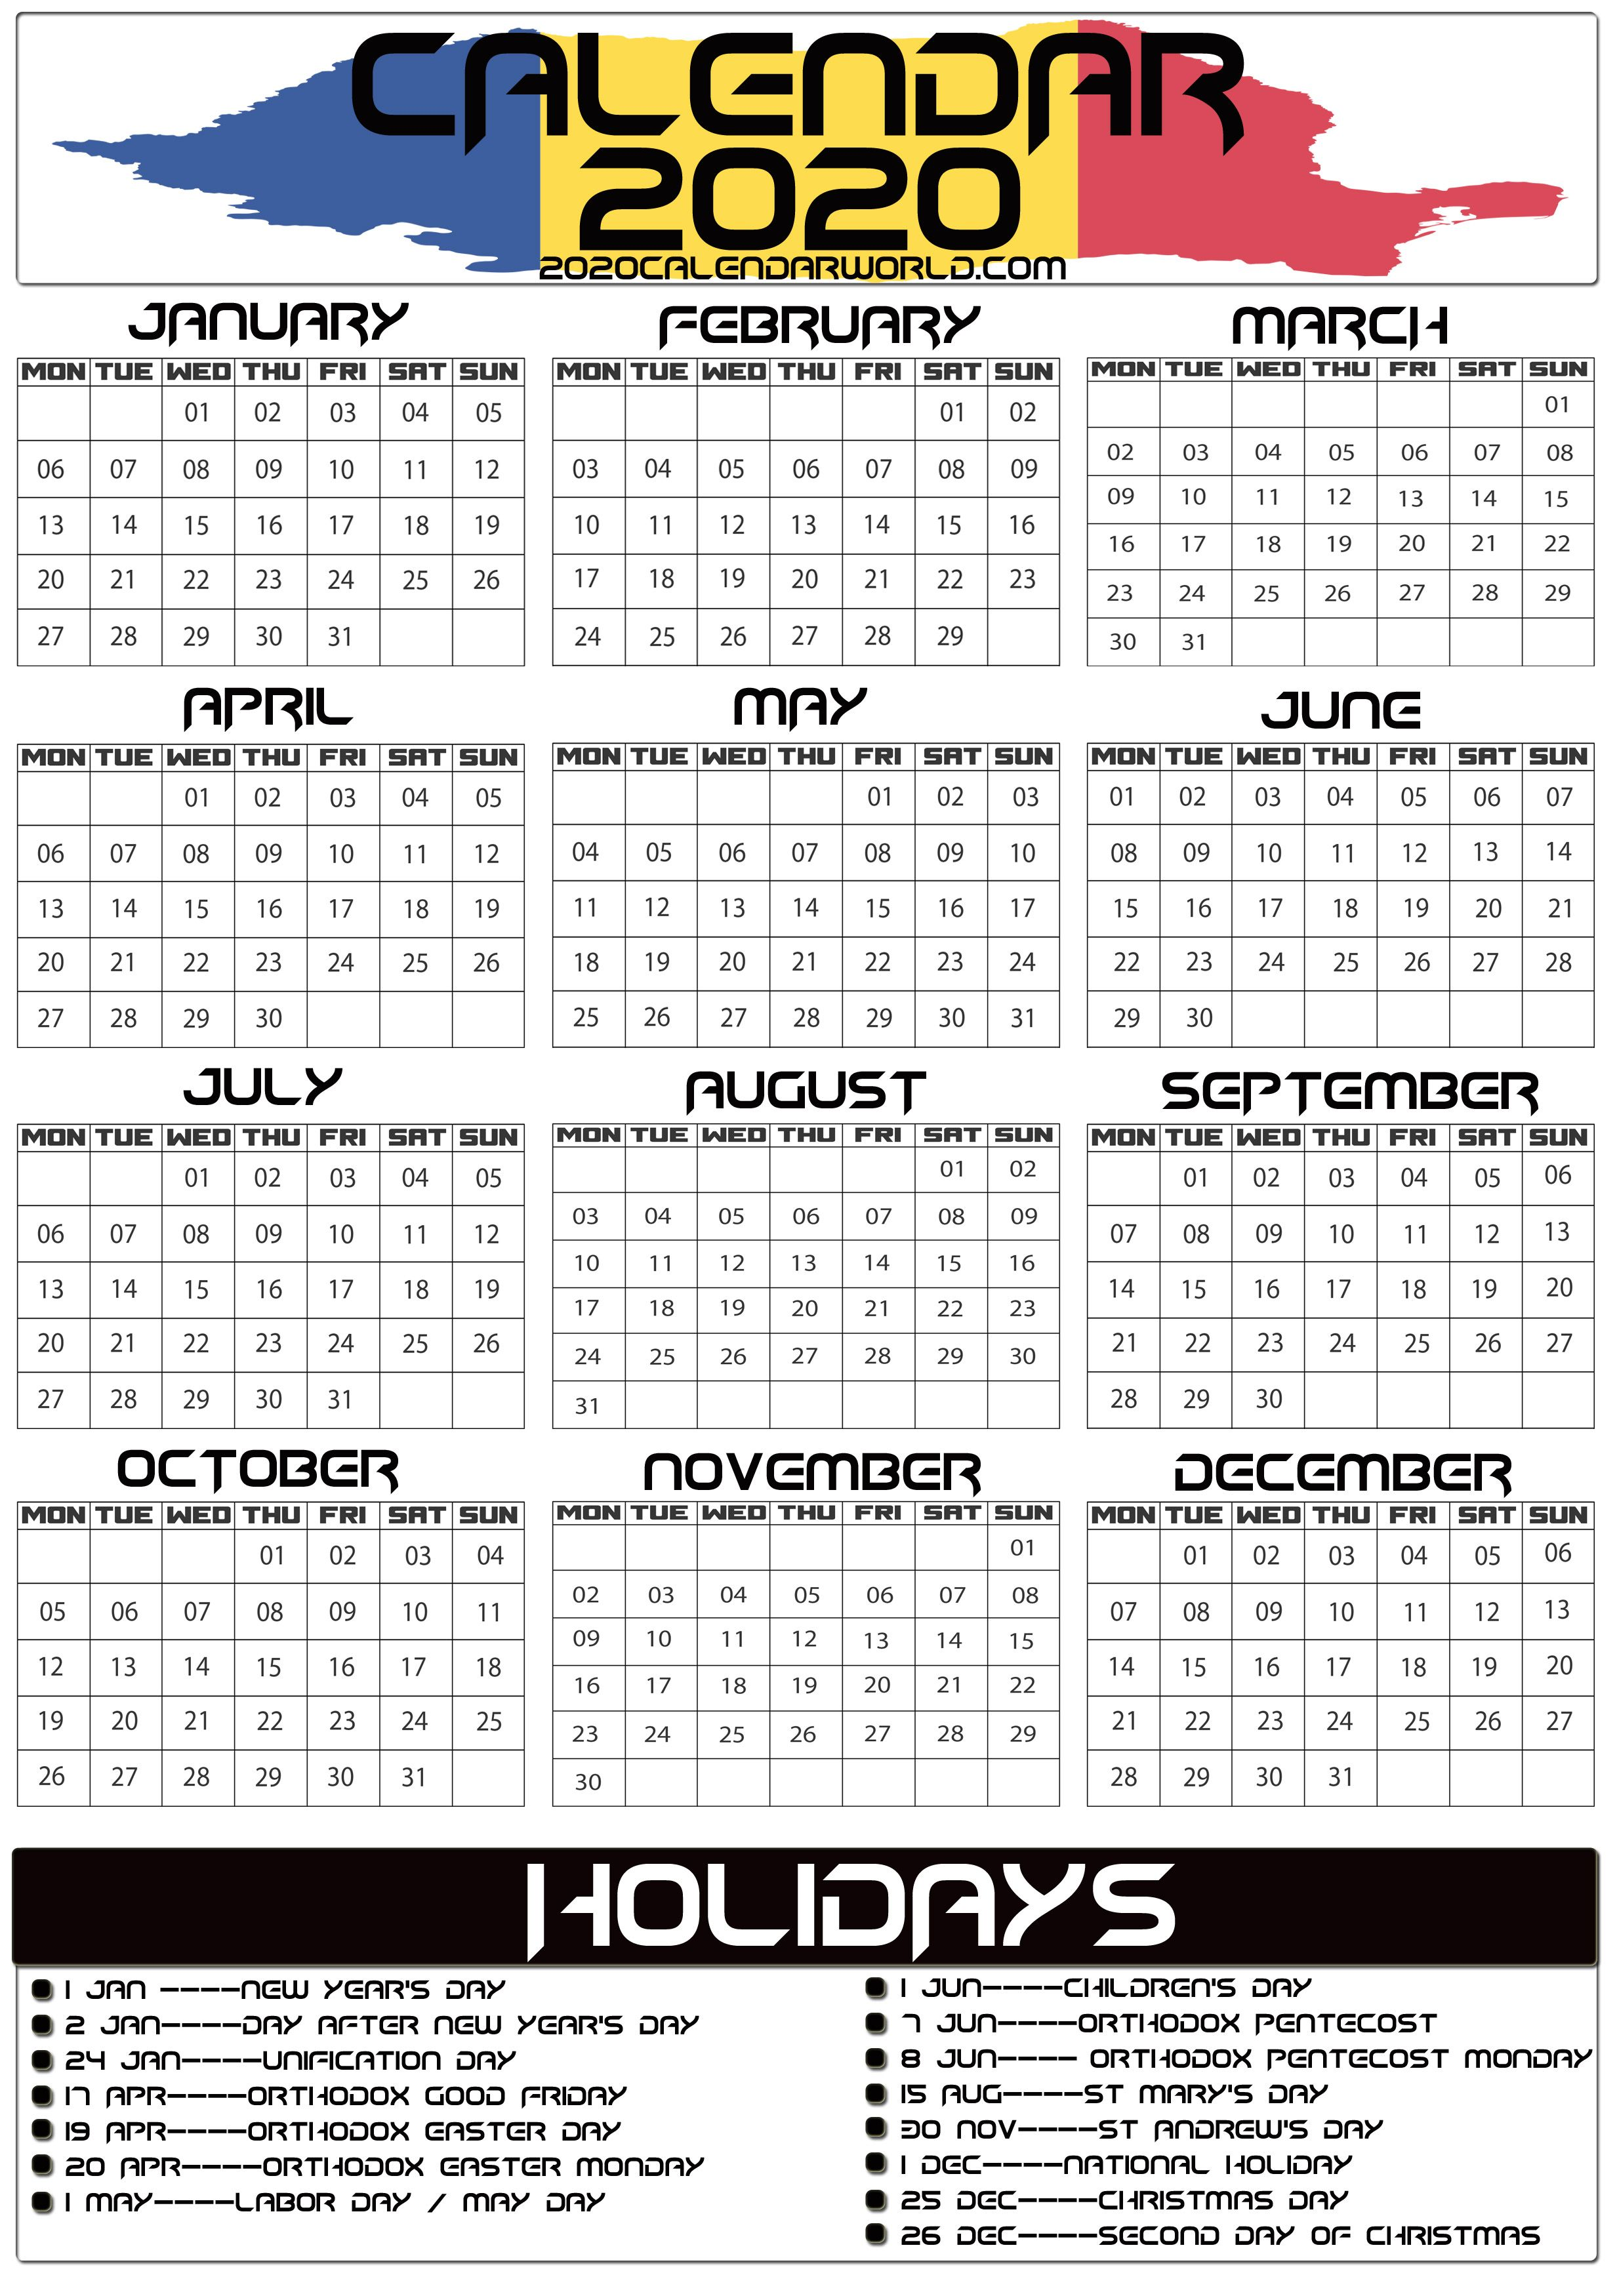 2020 Calendar Romania Holidays Calendar Holiday Printable Templates Holiday Printables